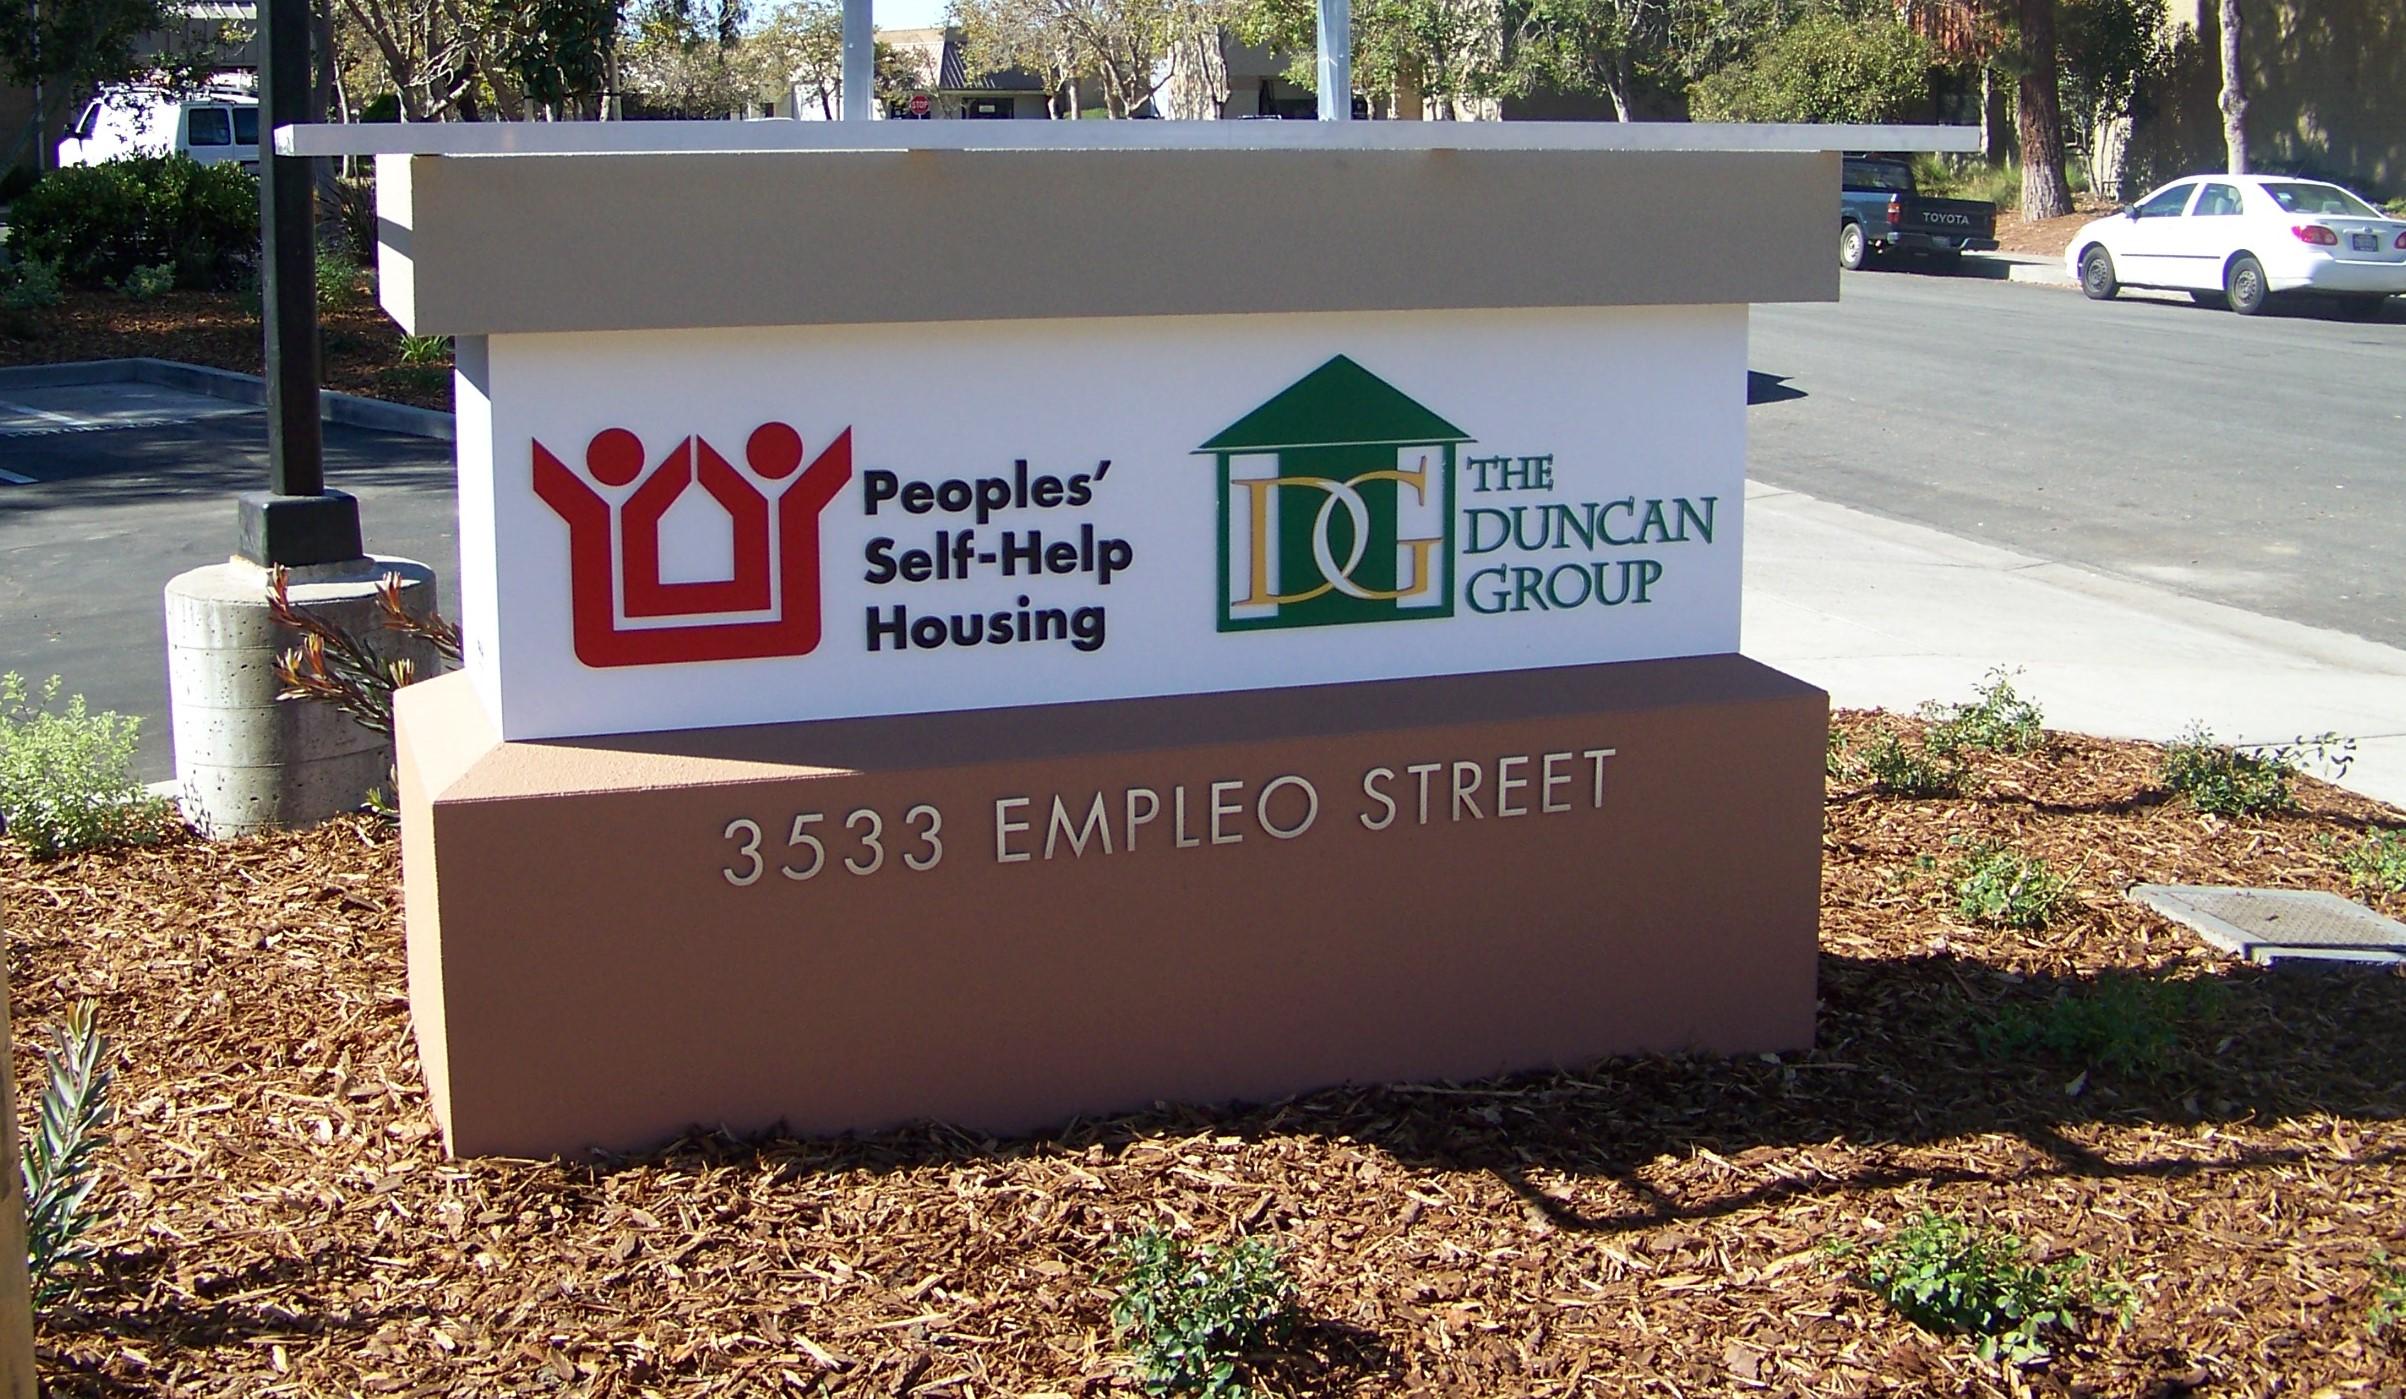 Peoples' corporate office in San Luis Obispo, California